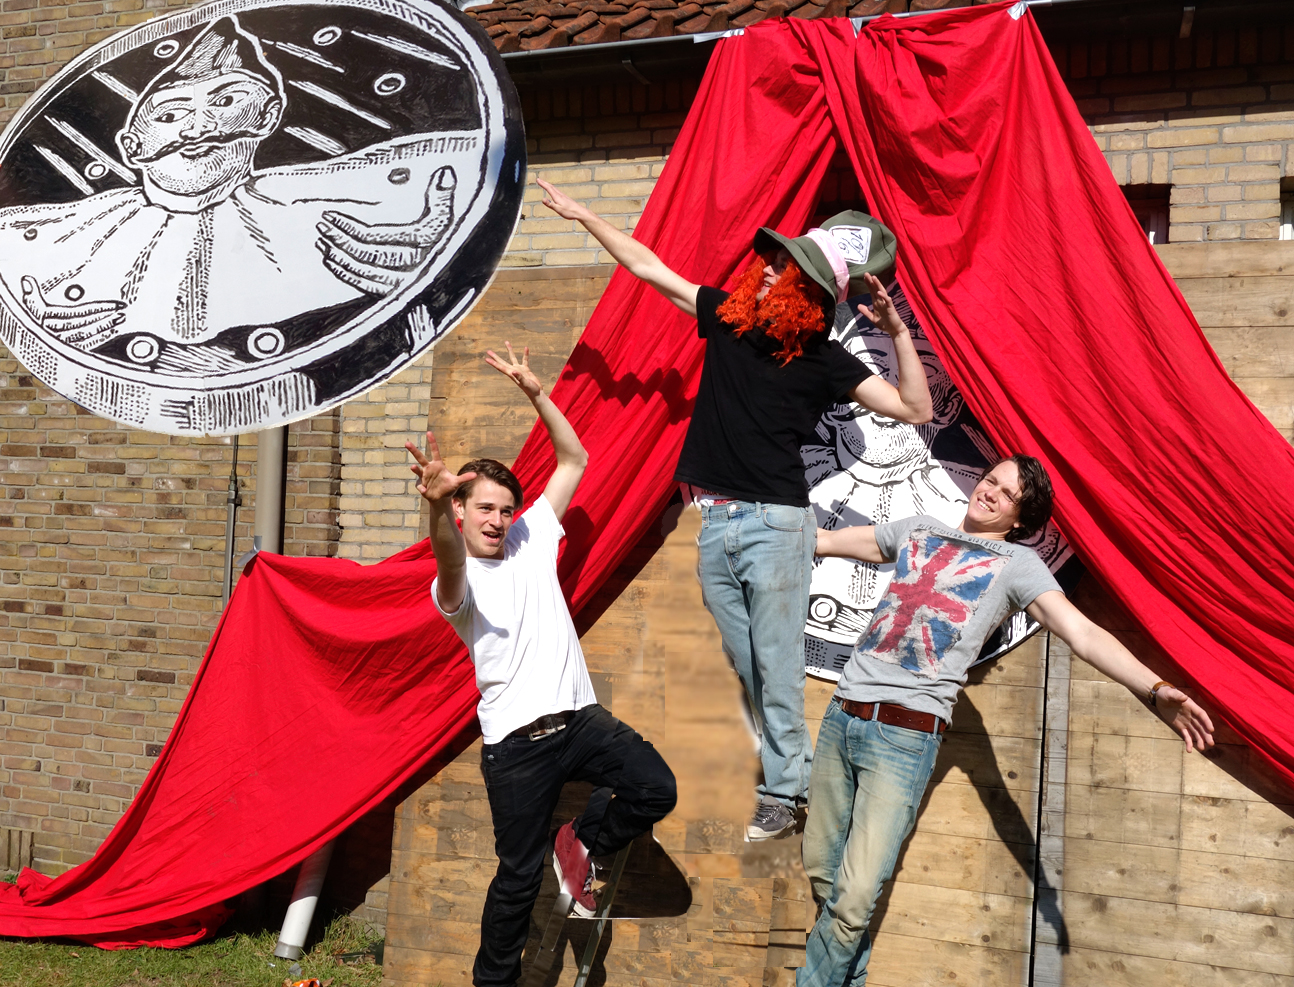 2014-Studentencircus-CirqueFolie-ondernemers HVA-fotocartoon AvH-1